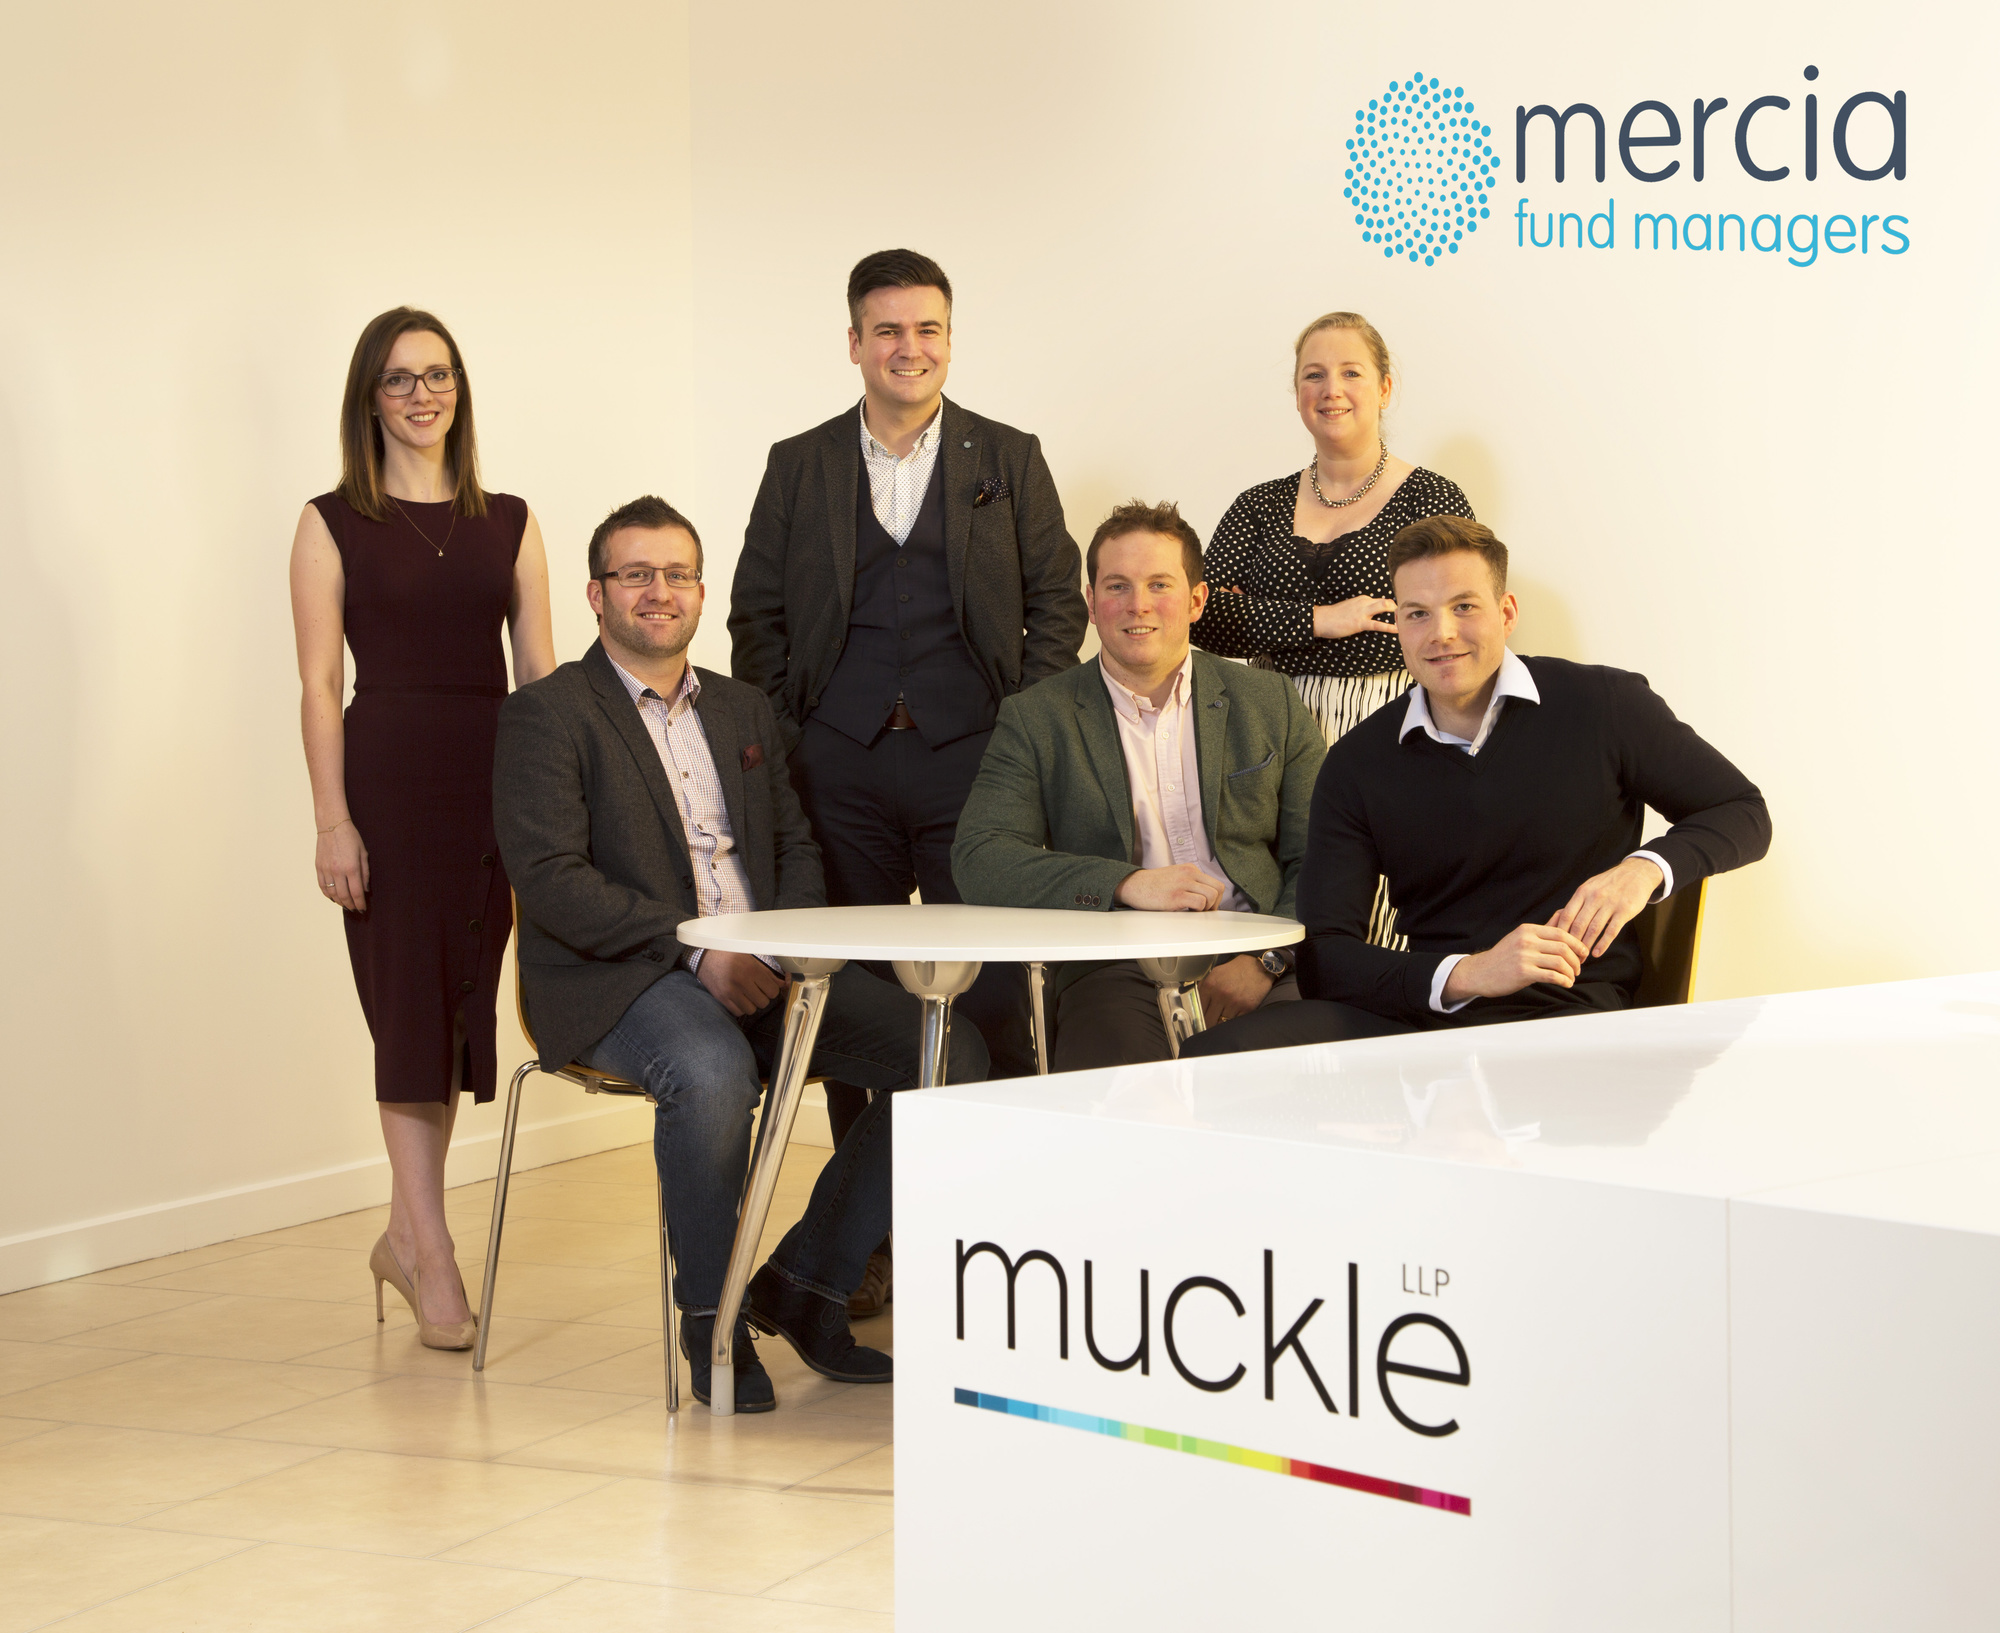 Stephanie Brown (Muckle), James Allsopp, Ian Wilson, Jan Oosthuizen (Mercia), Amy Wanless and Adam Rayner (Muckle)